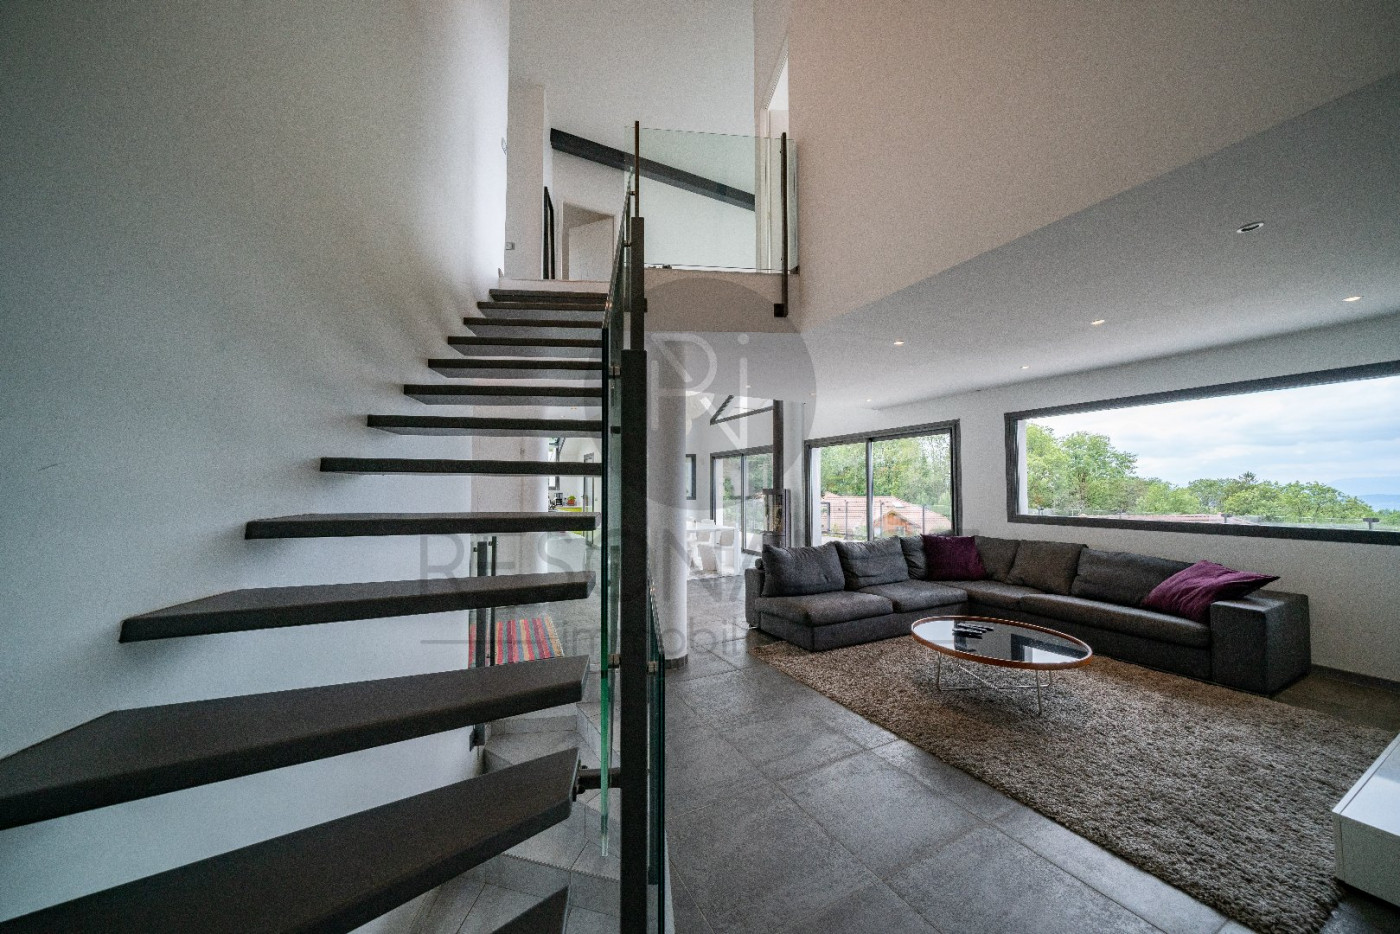 A vendre Villaz 74023171 Resonance immobilière